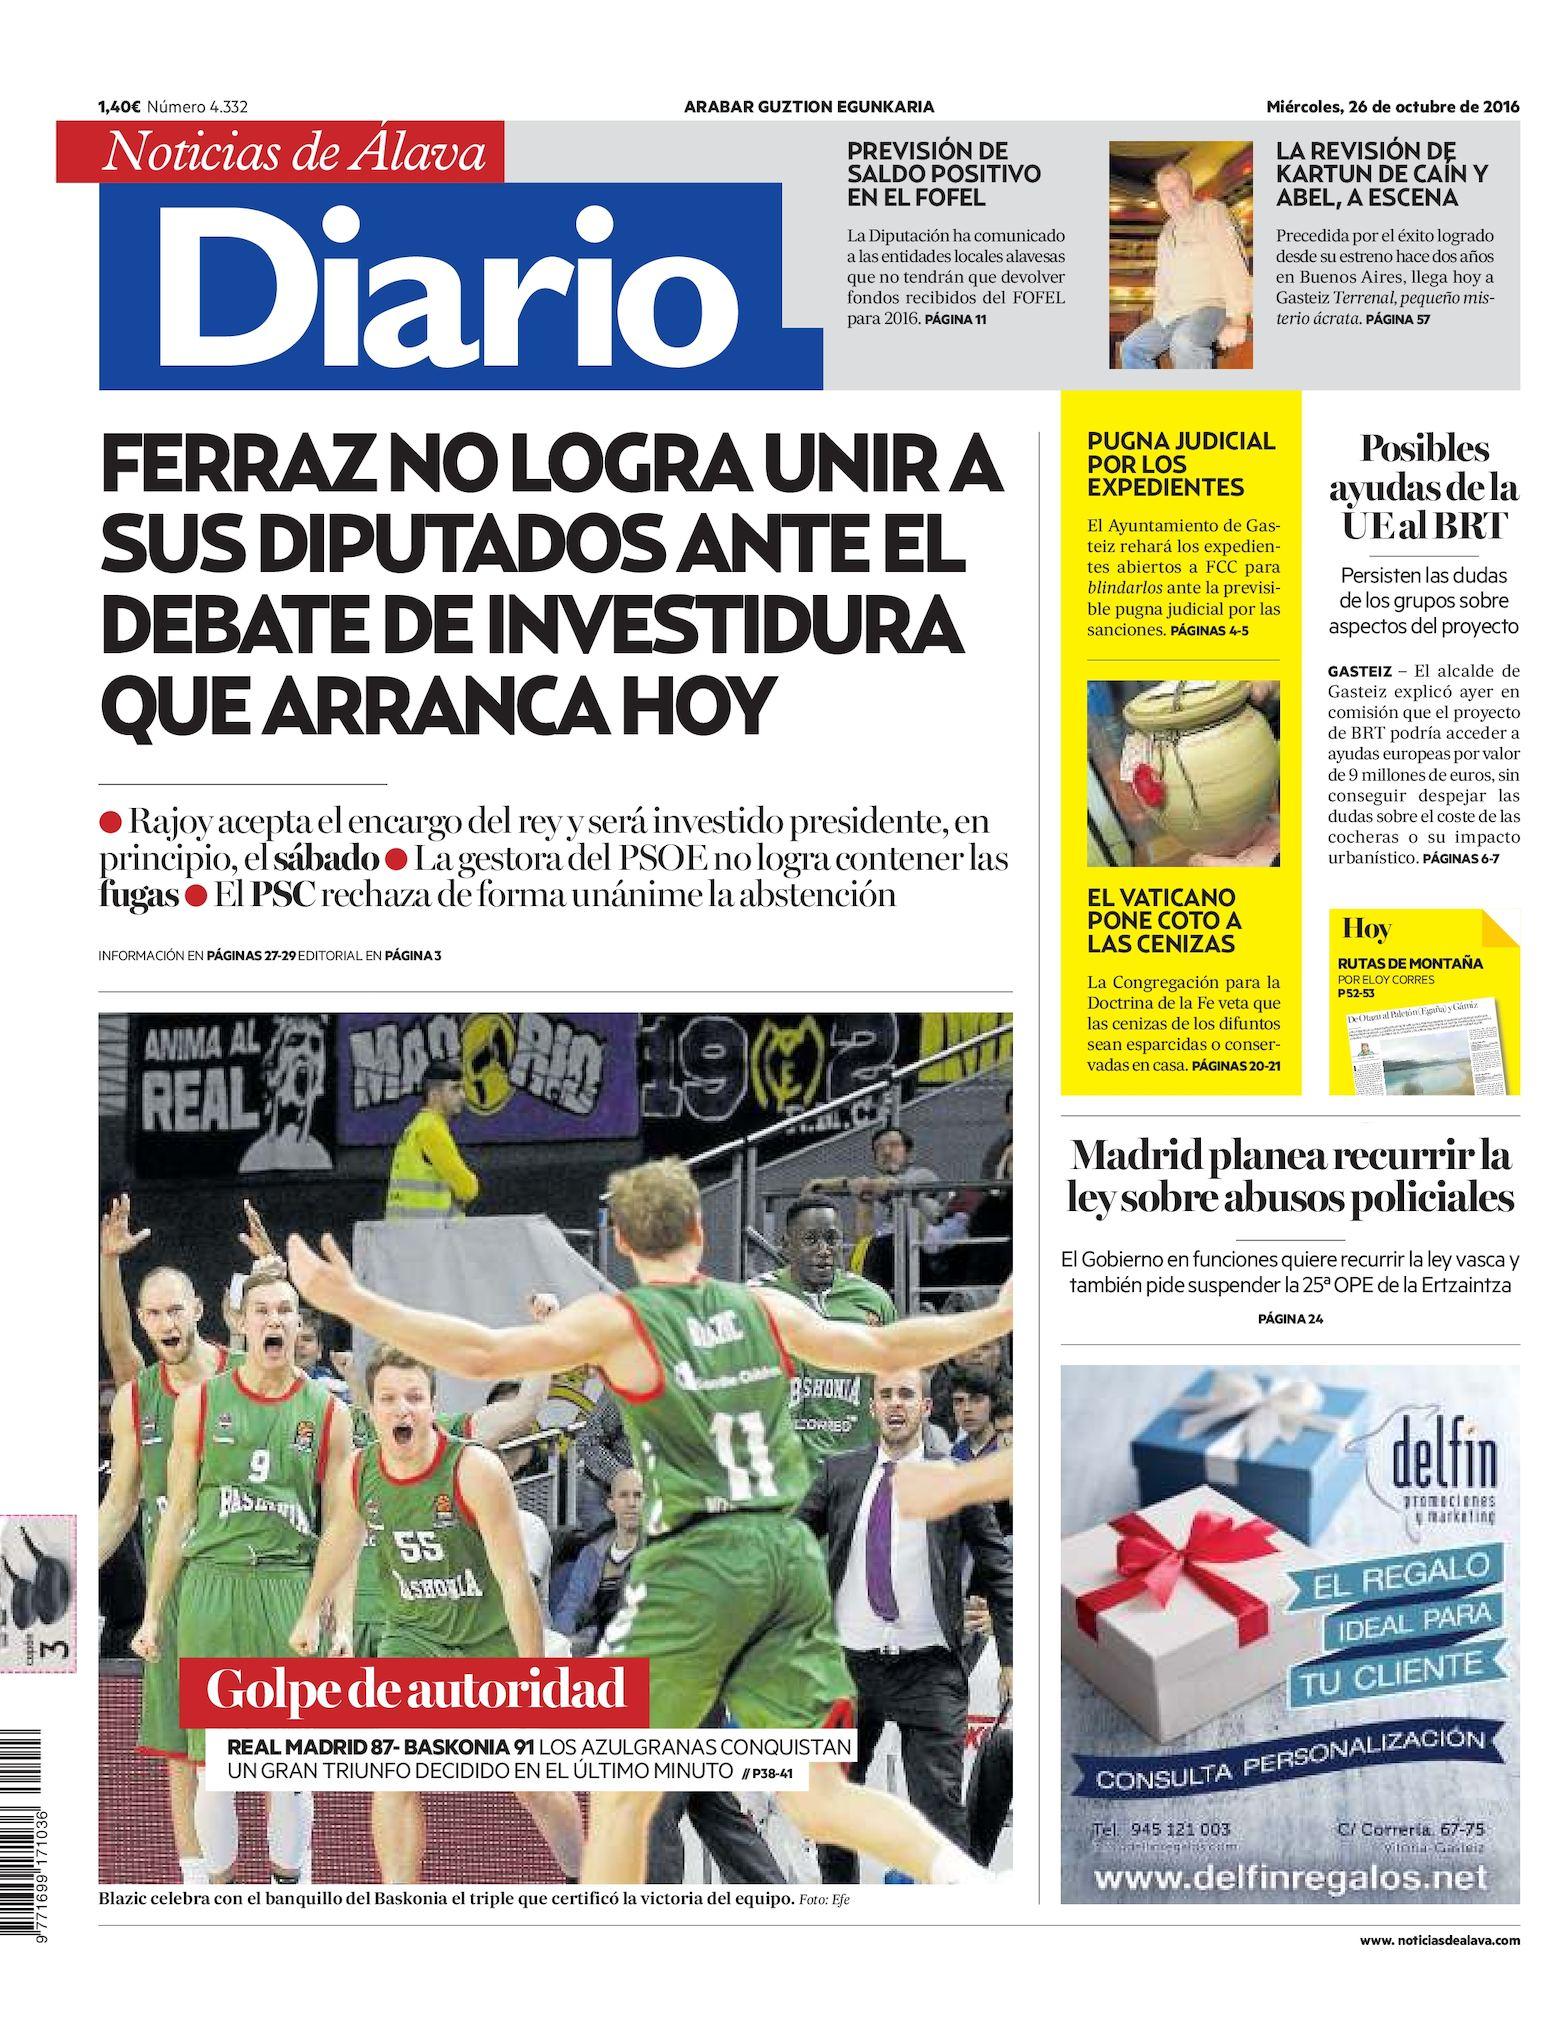 Calaméo - Diario de Noticias de Álava 20161026 f00ceca833b14